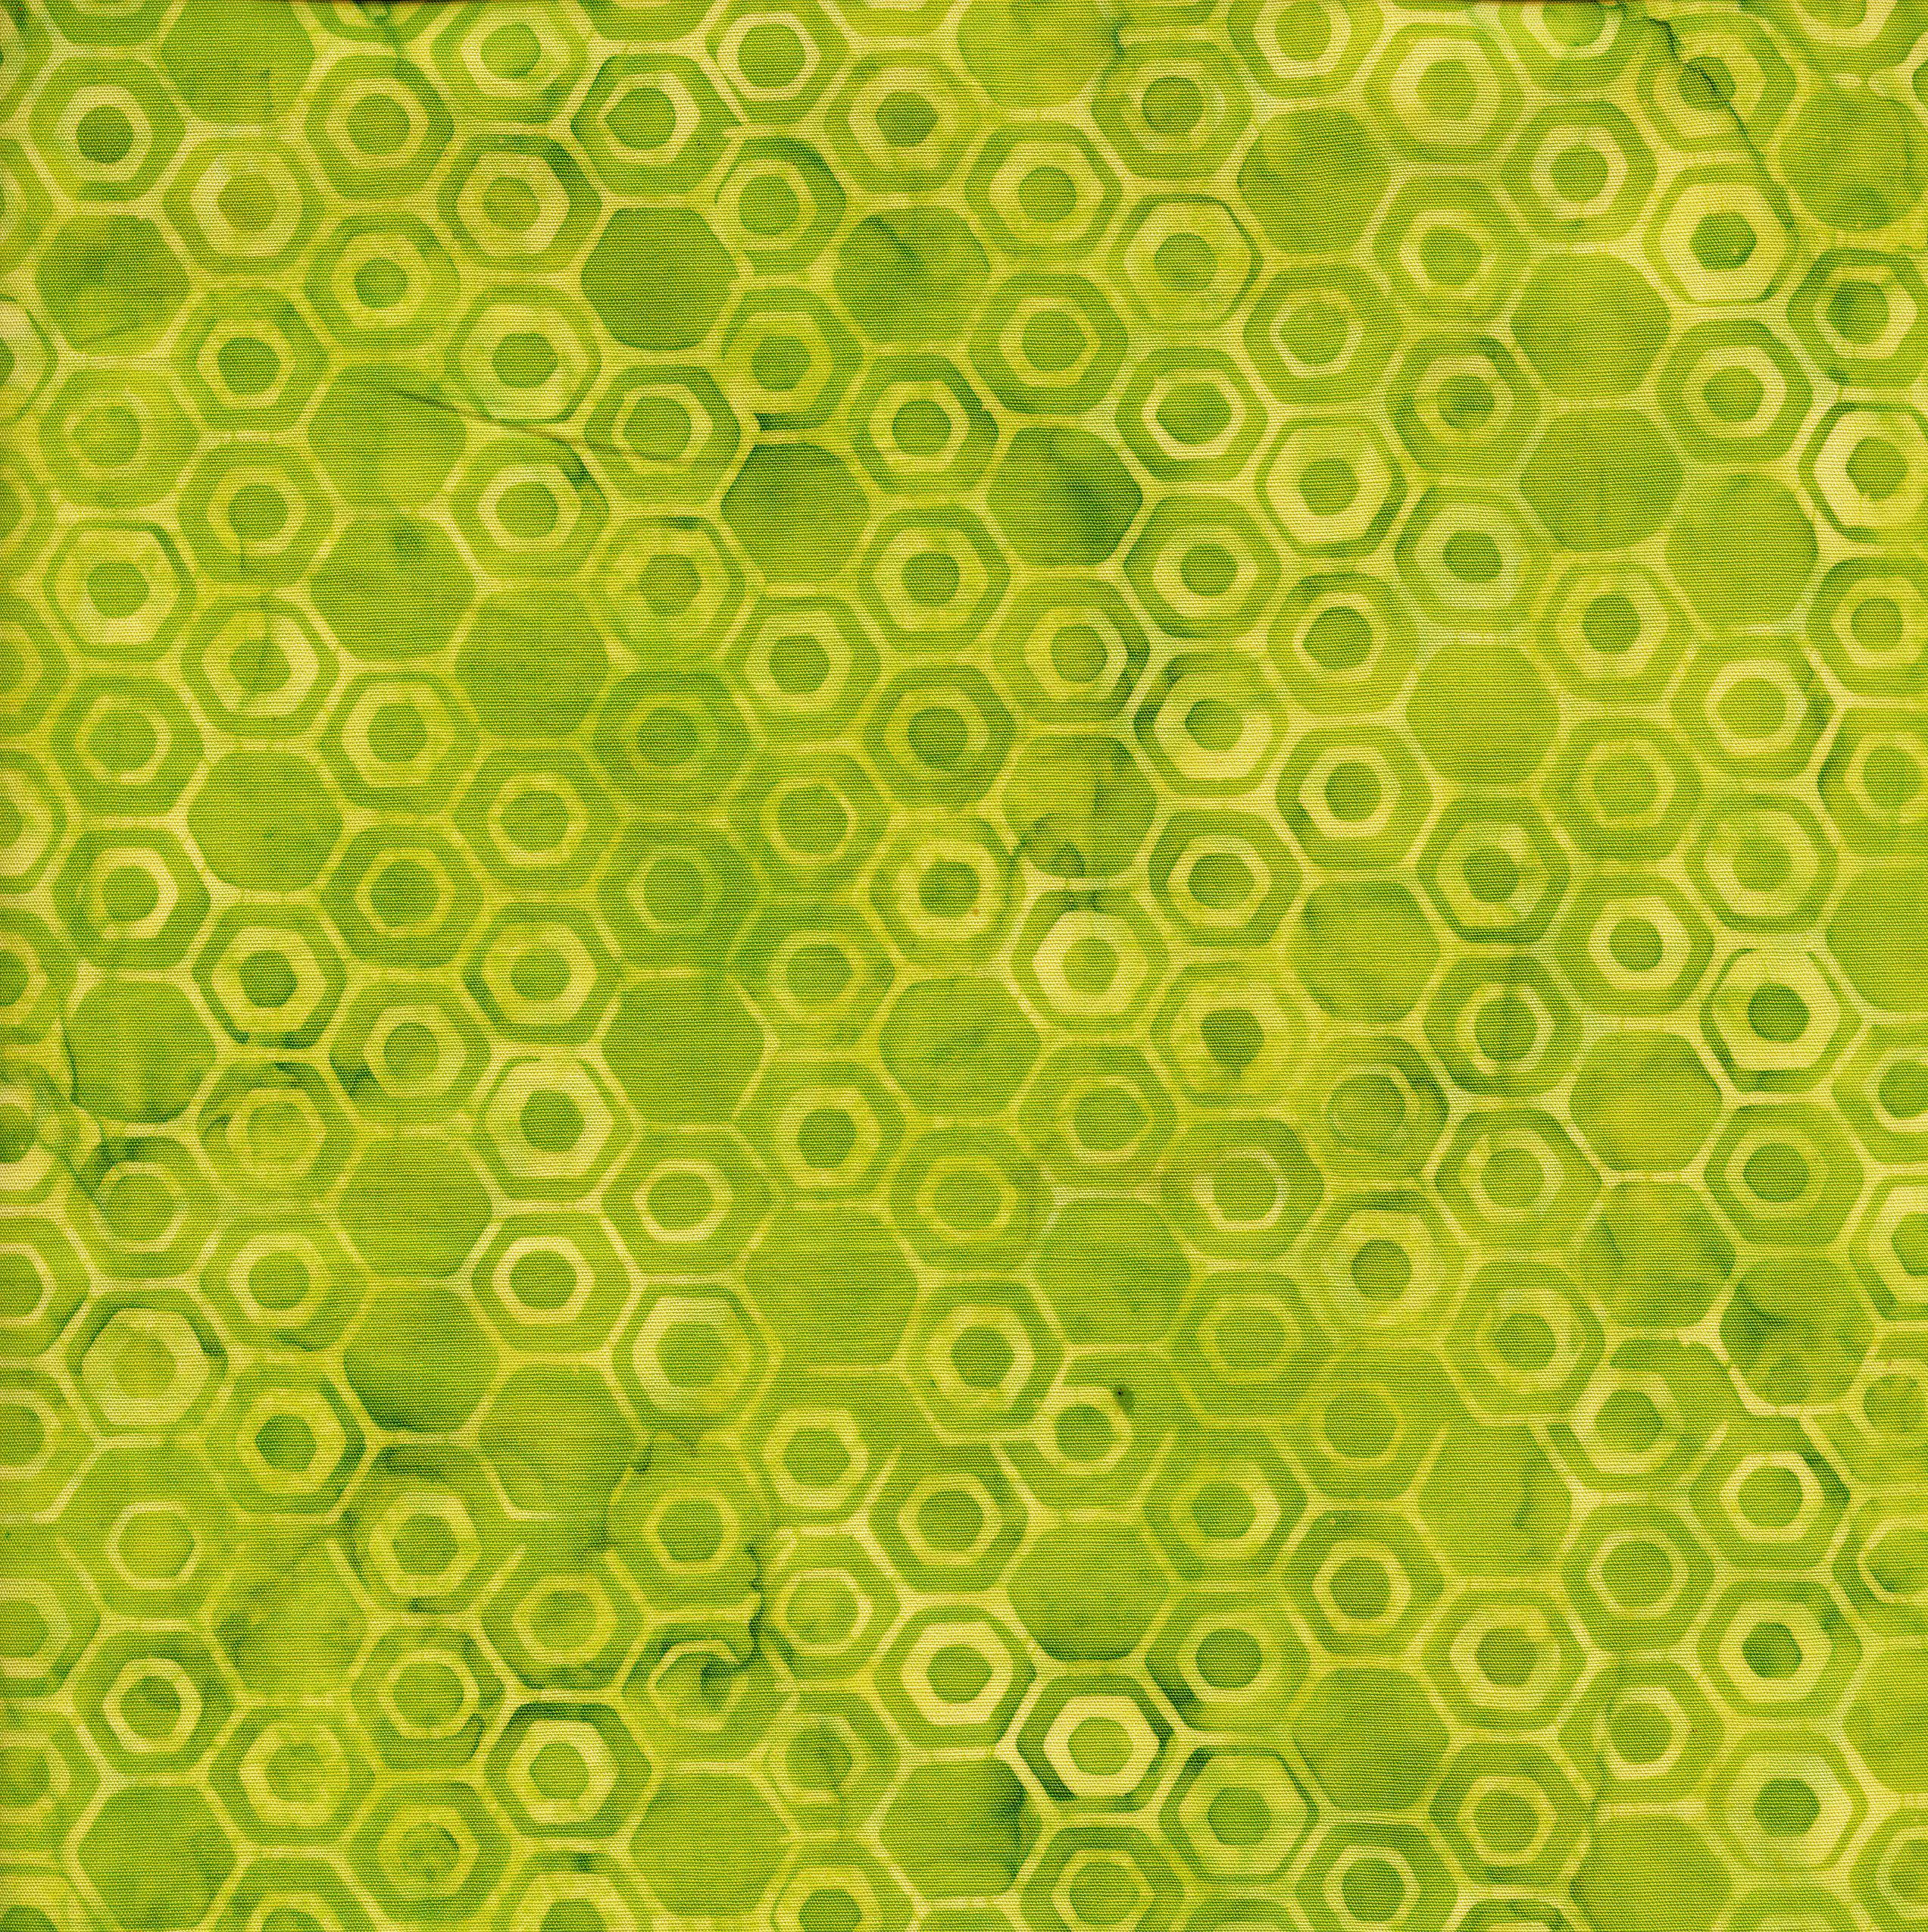 111810615 / Honeycomb-Lime